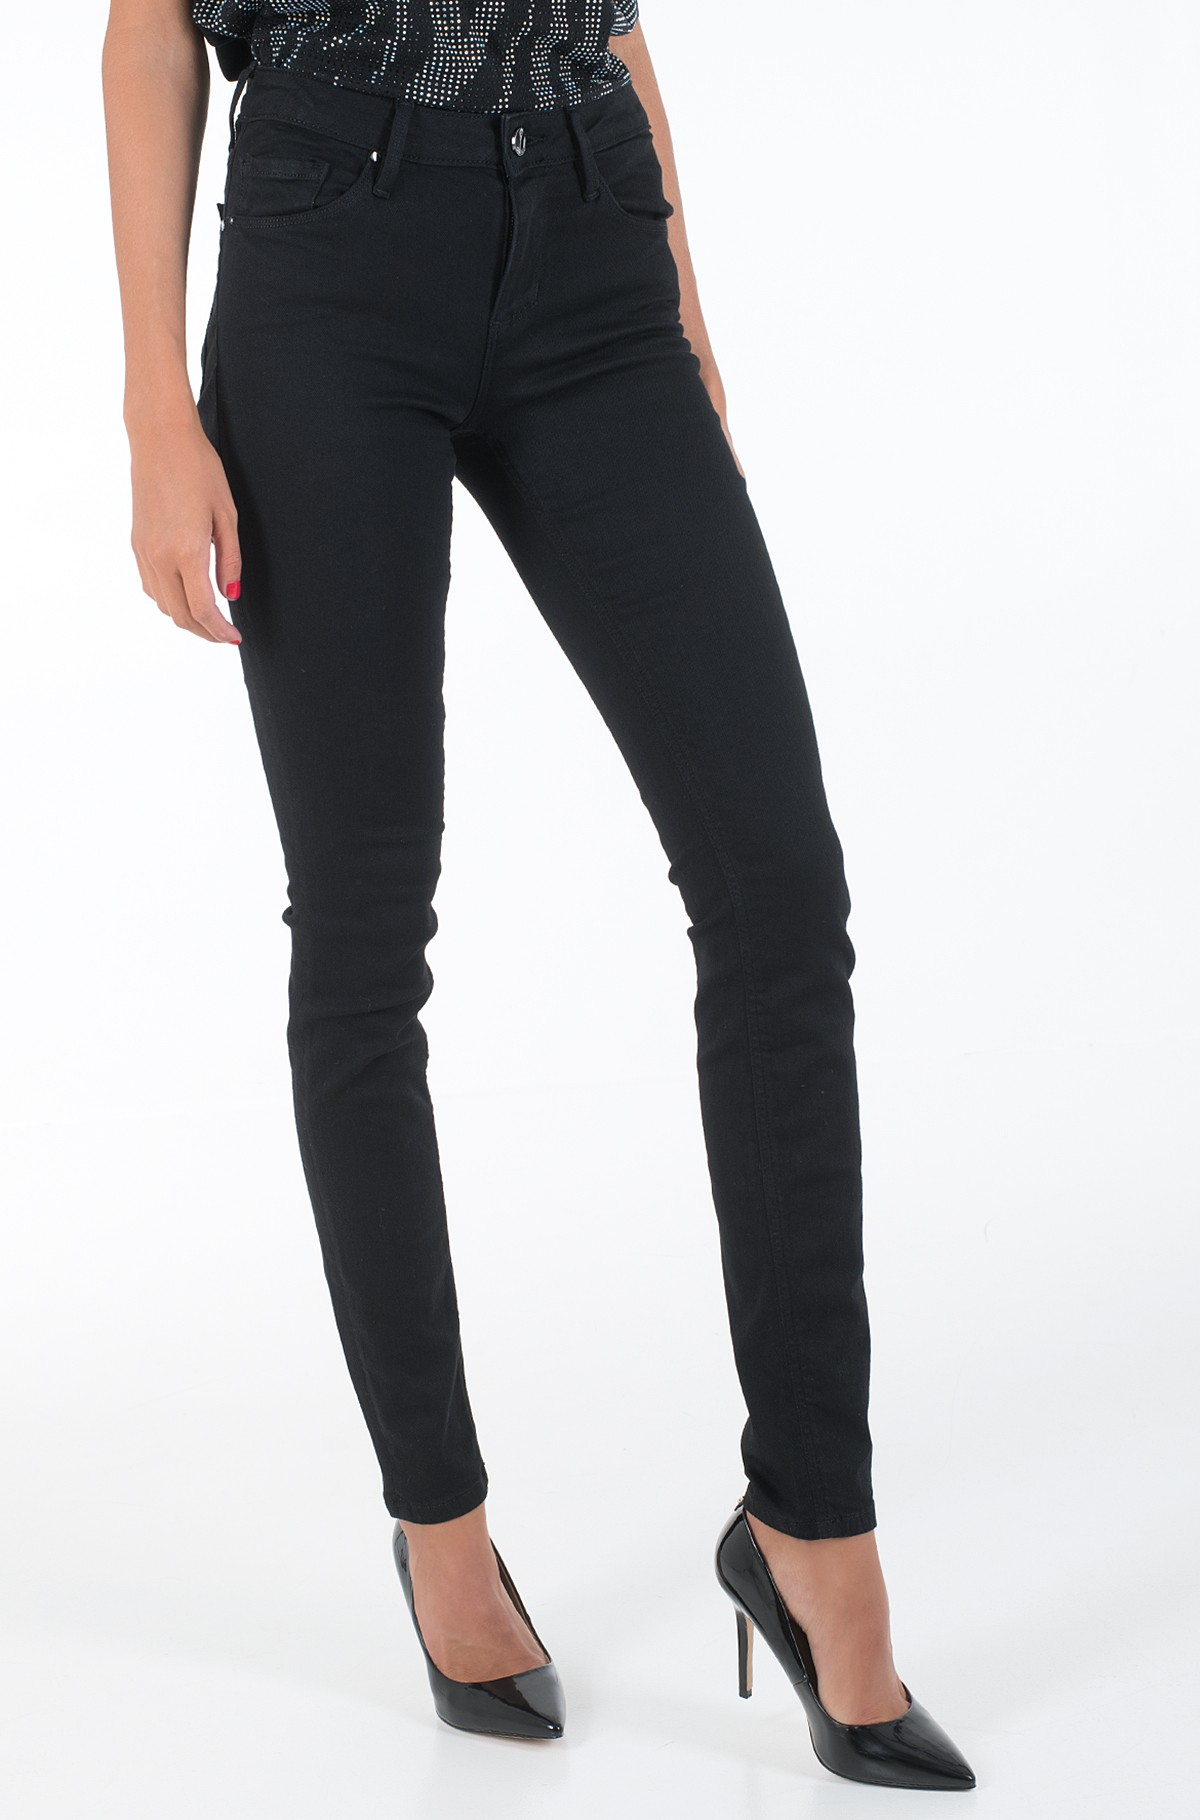 Jeans W0YA99 D3OA4-full-1